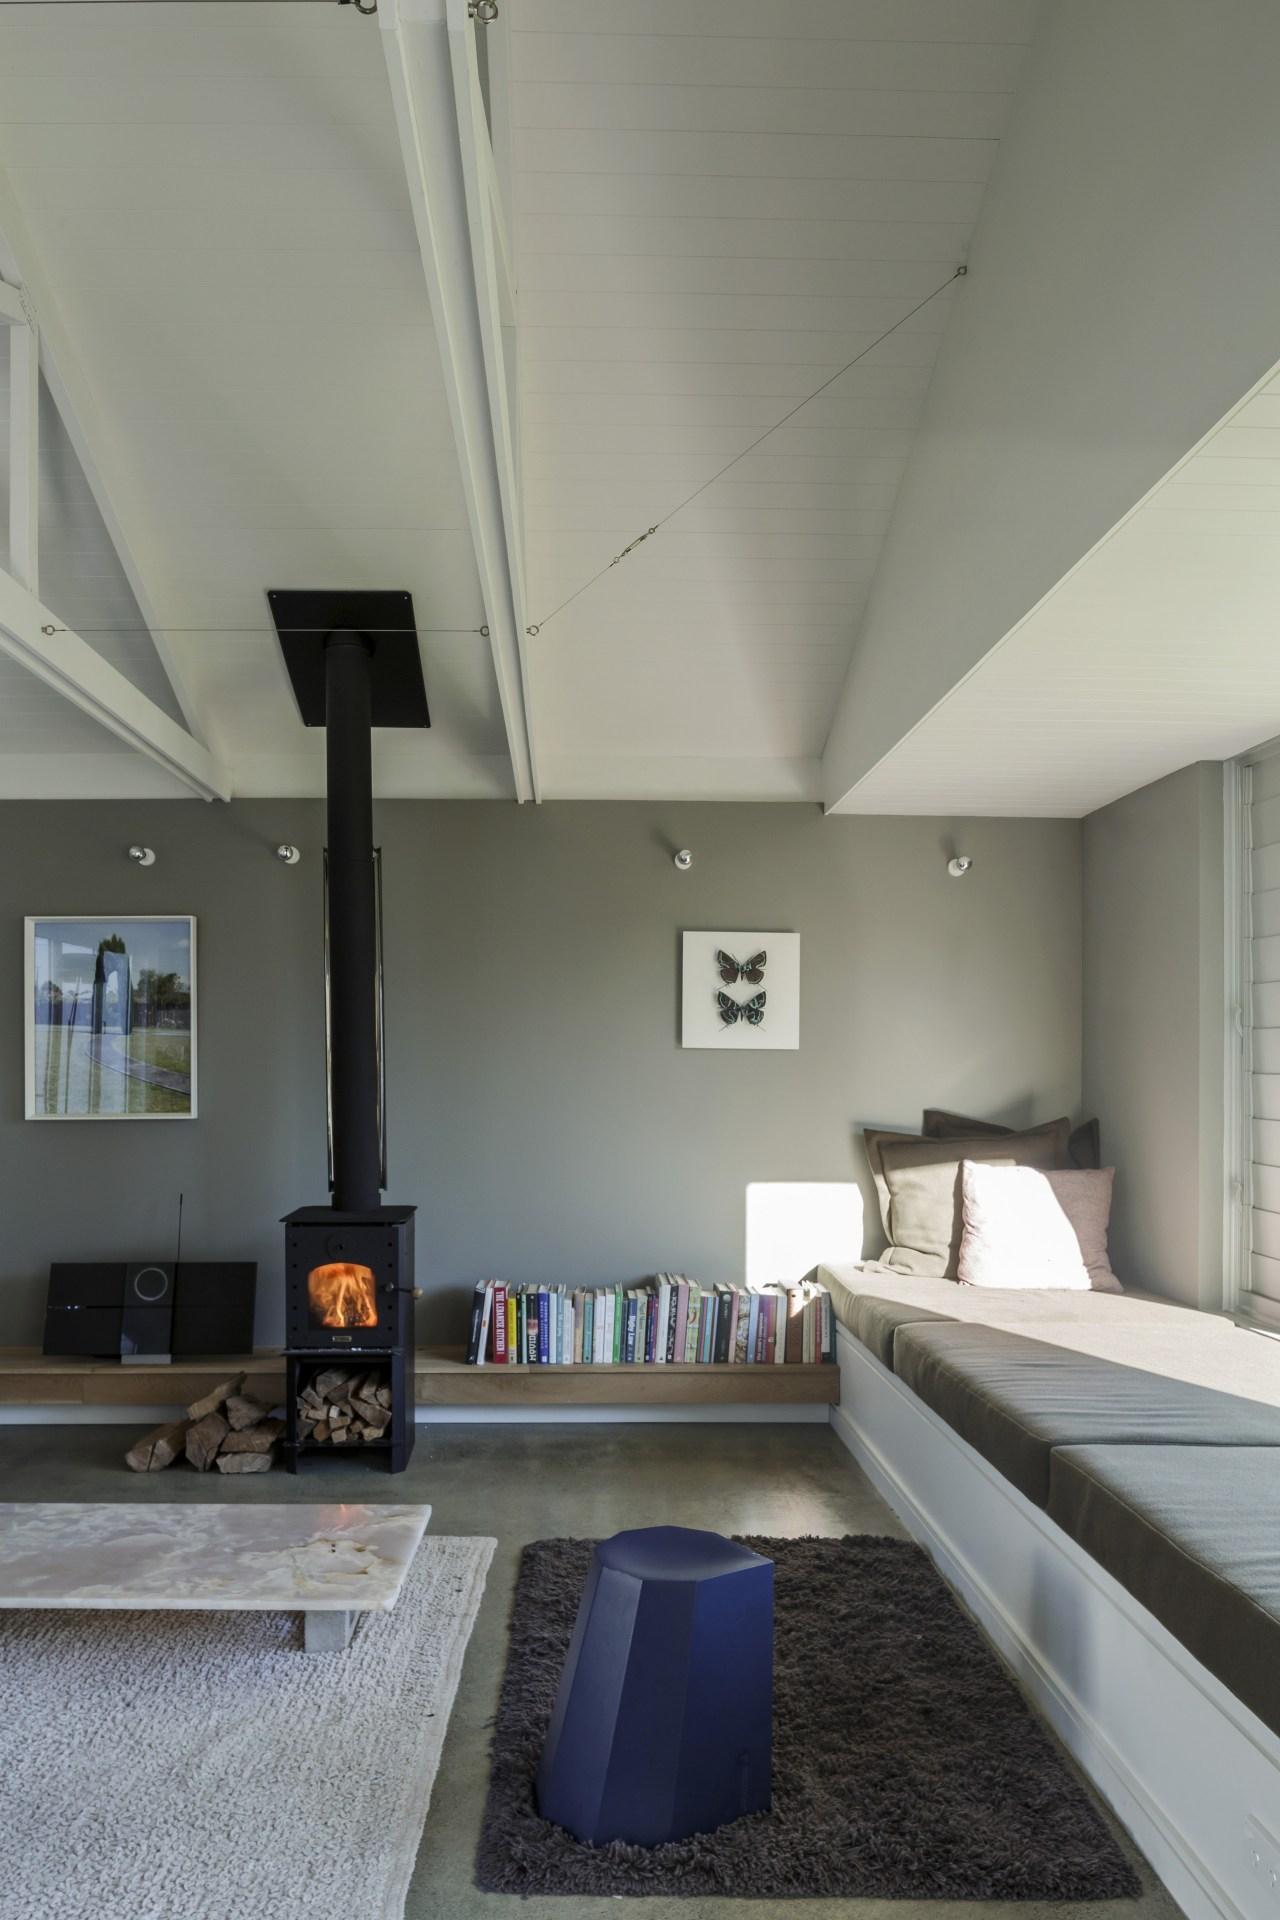 Resene paints, including Resene Friar Grey and Resene architecture, ceiling, daylighting, house, interior design, living room, loft, gray